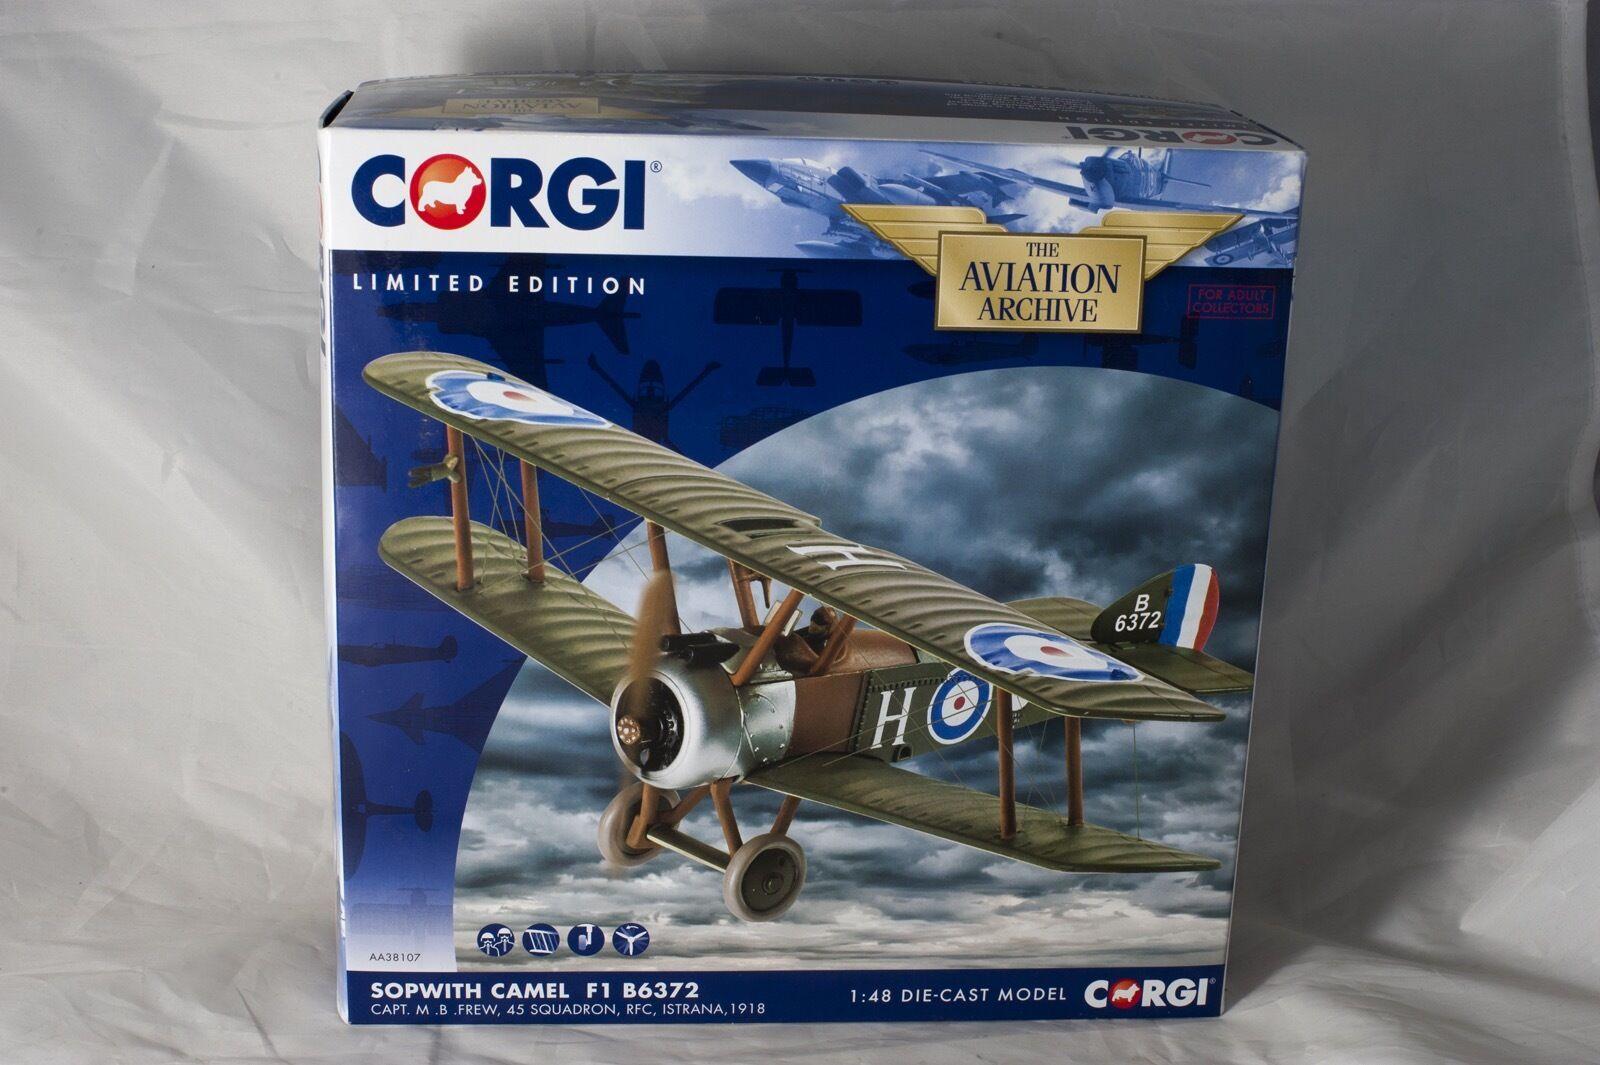 Corgi Sopwith Camel F1 B6372 Capt. M. B. Frew, 45 Squadron RFC 1 48 B BBAA38107